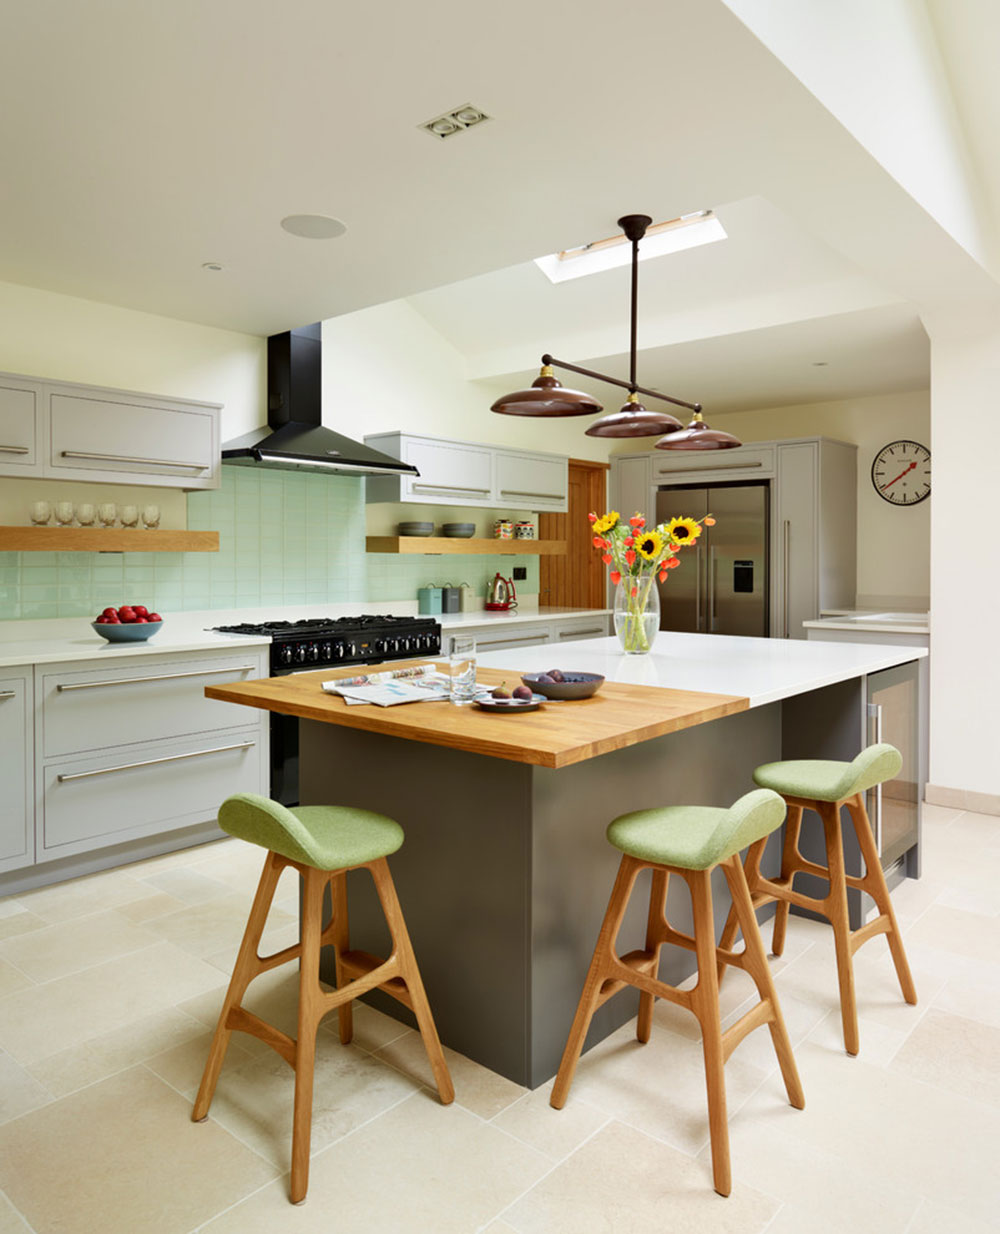 Modern Kitchen Island Designs with Seating-8 Modern Kitchen Island Designs with Seating